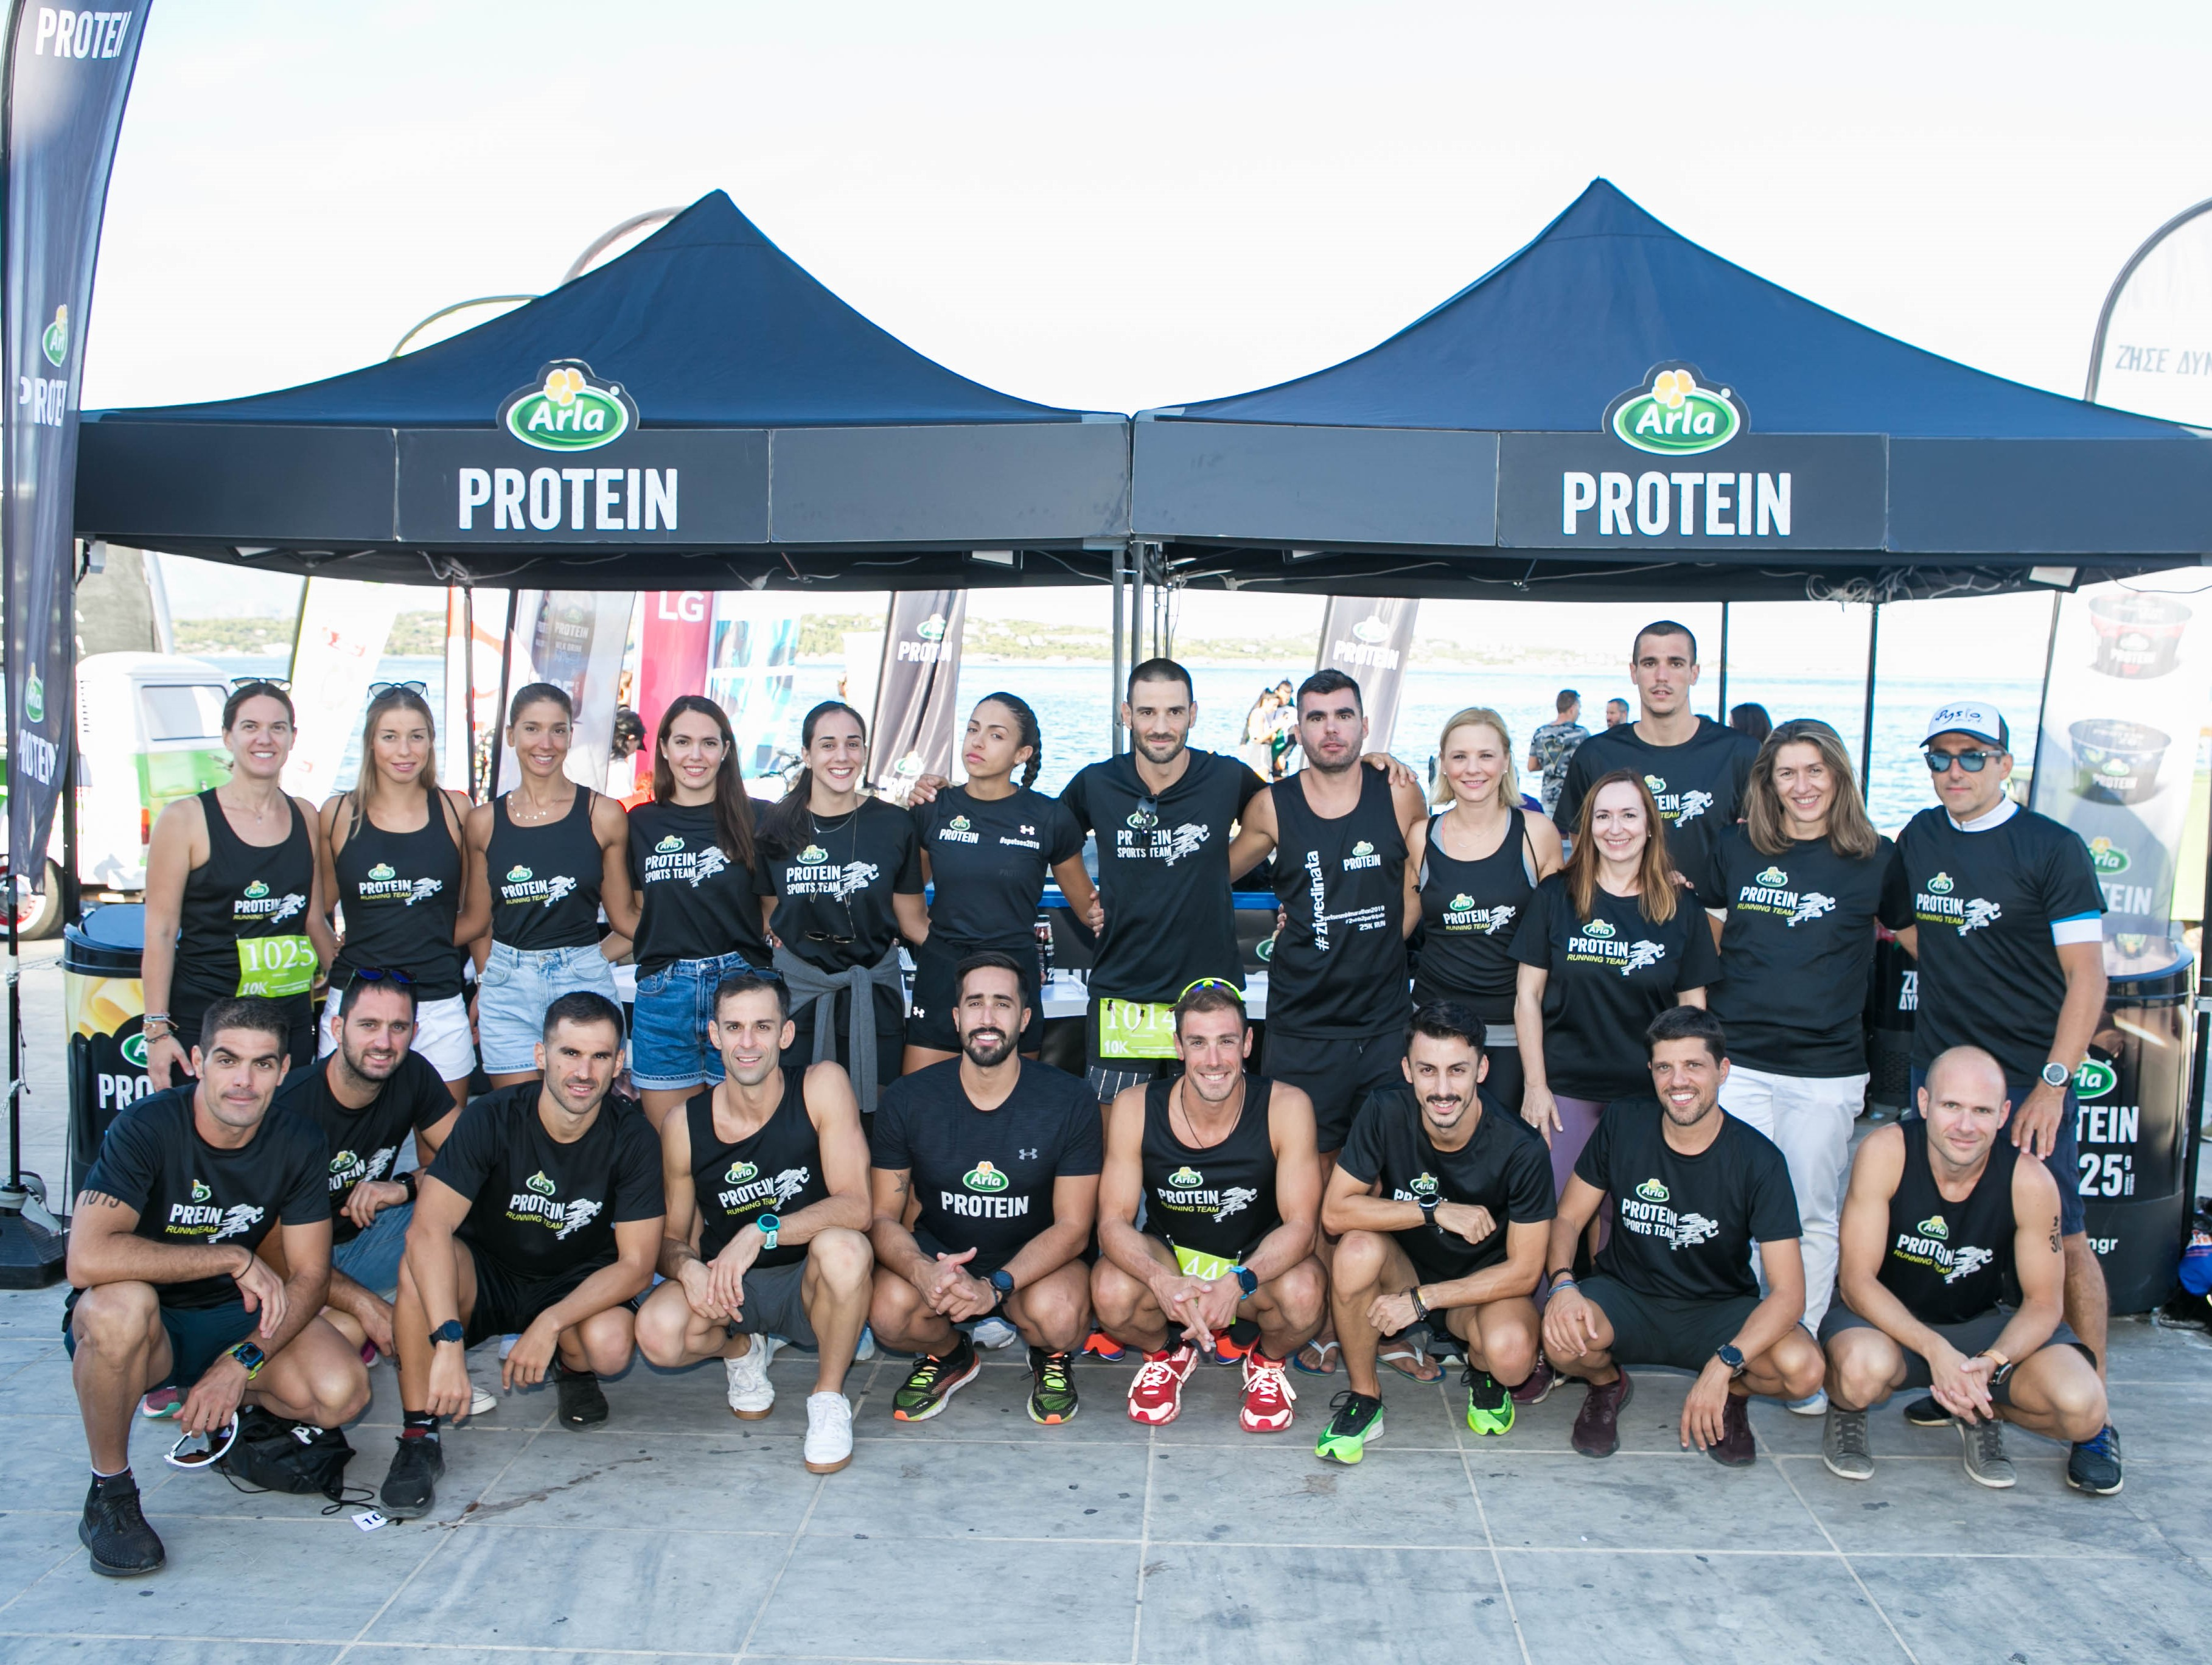 arla-protein-athletic-team-pan_0353-photo-credits-studio-panoulis